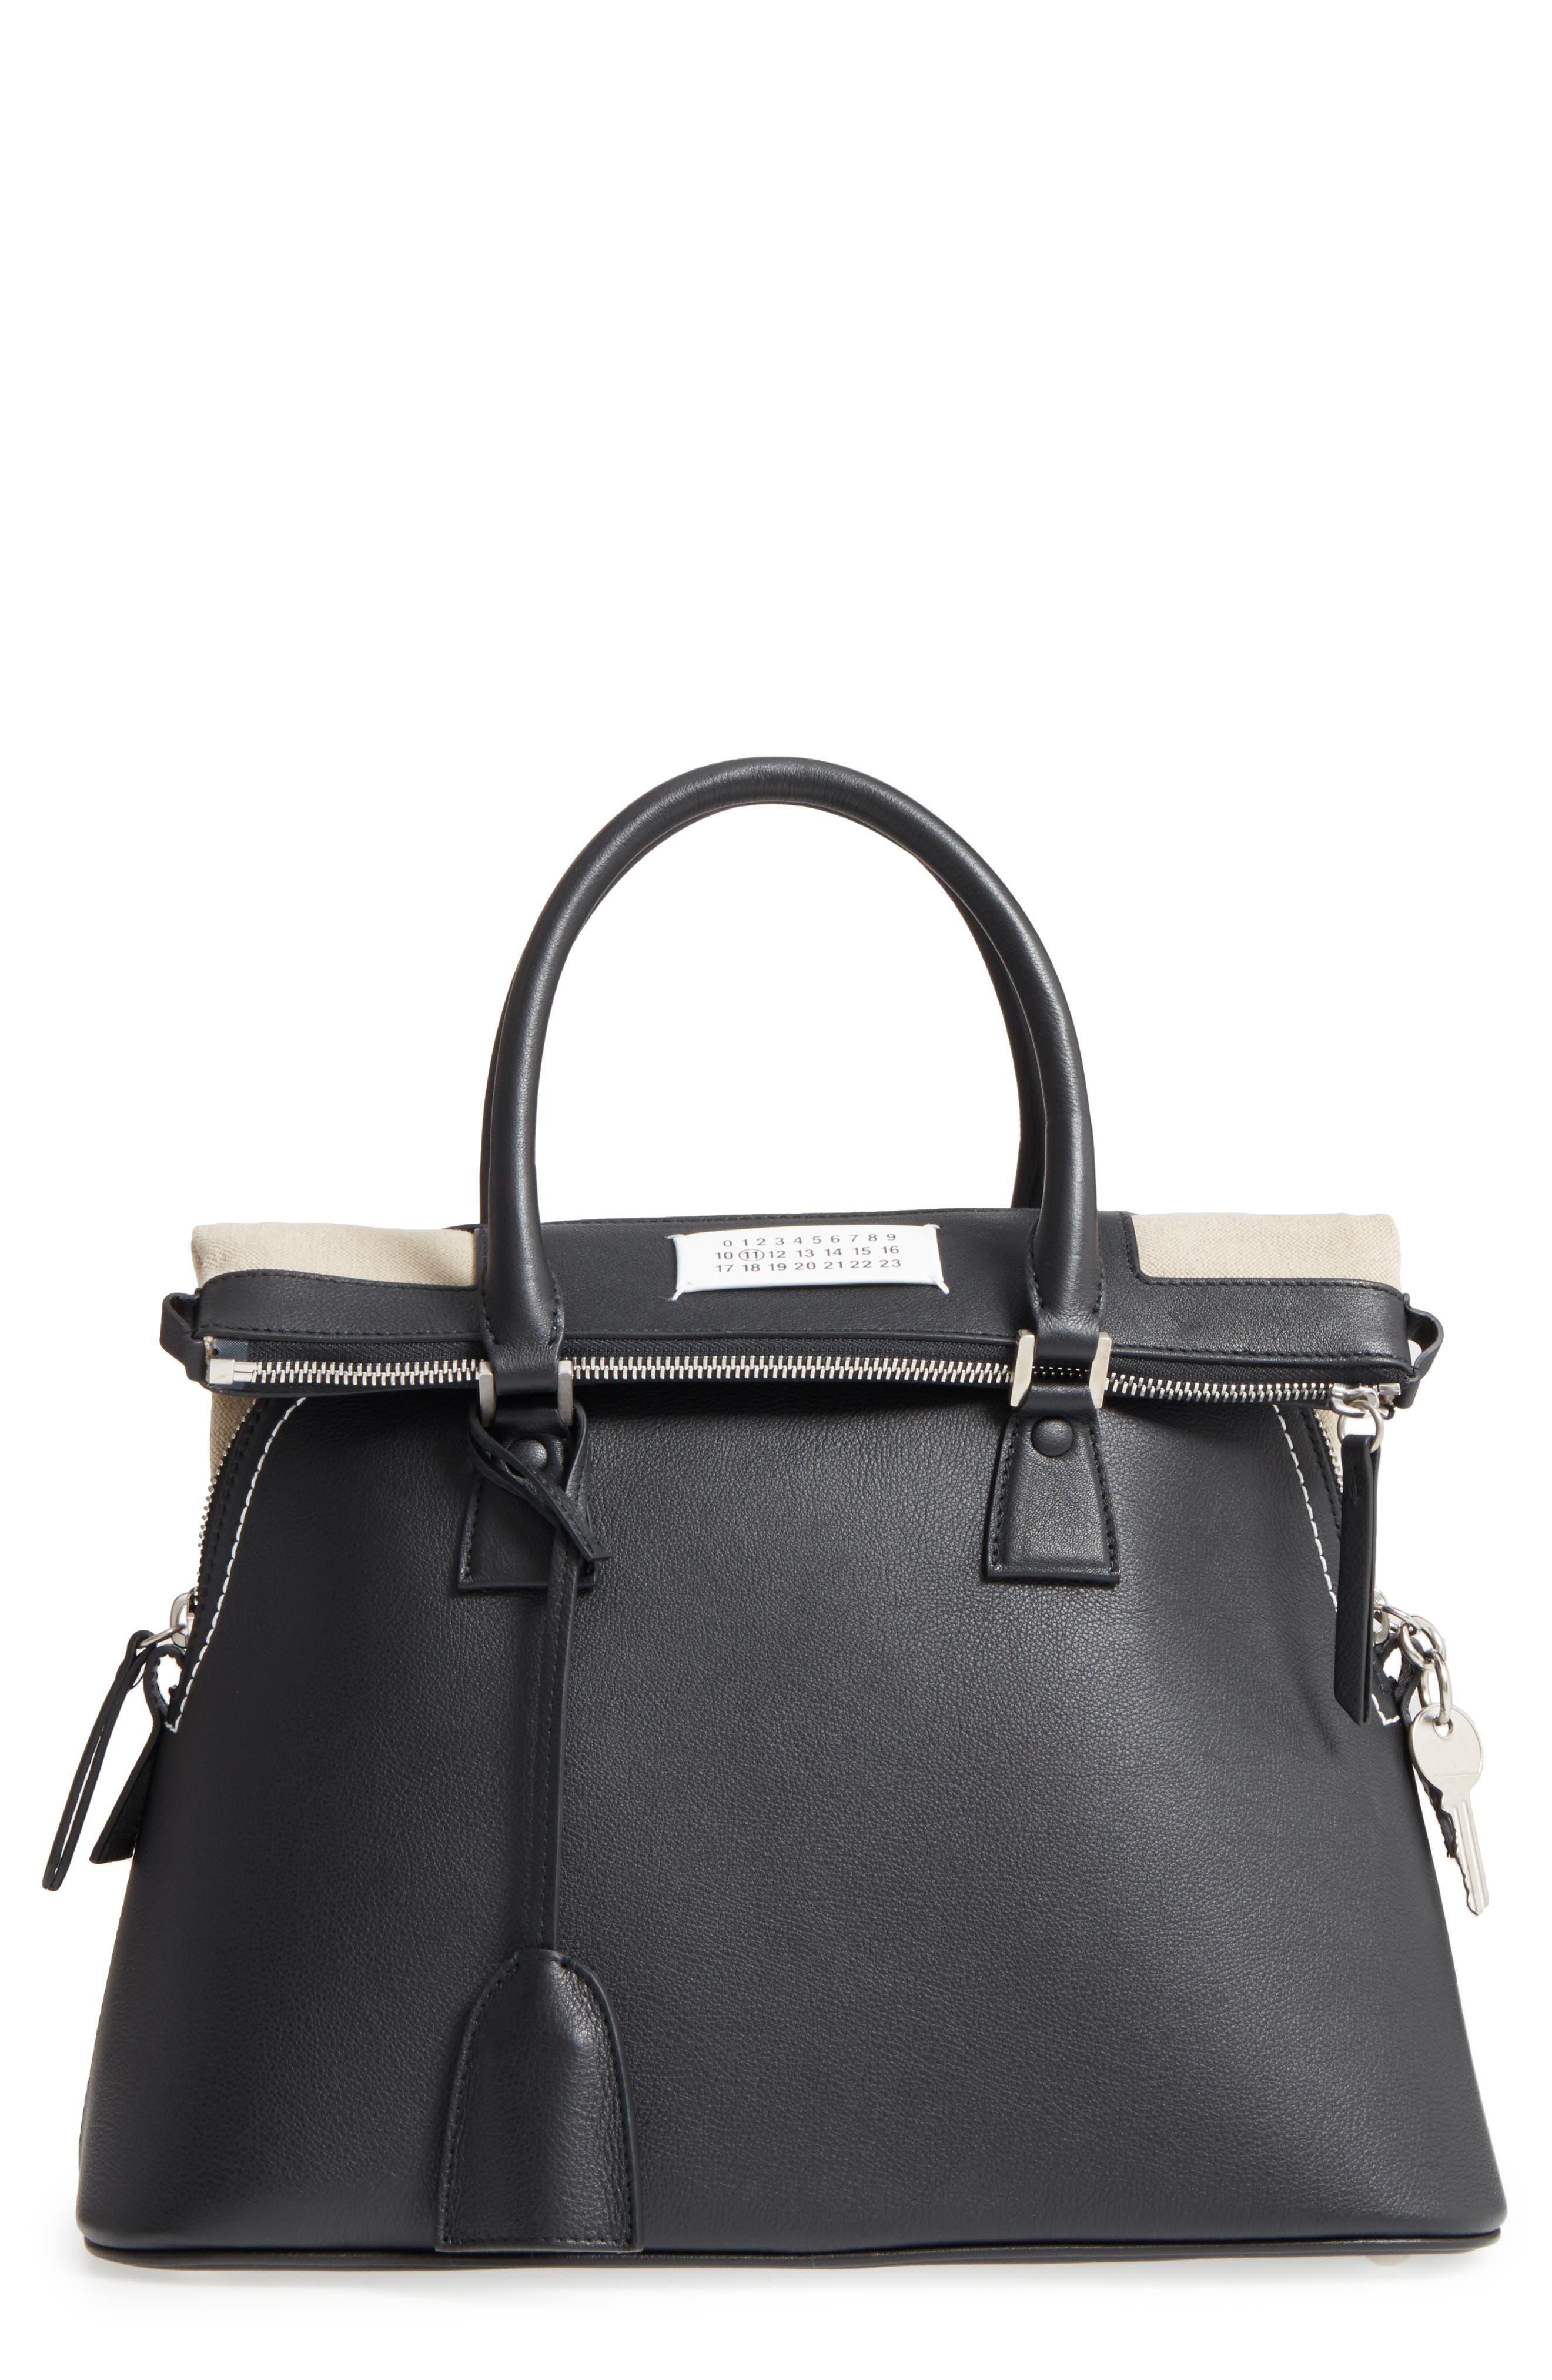 Medium 5AC Leather Handbag,                             Main thumbnail 1, color,                             001